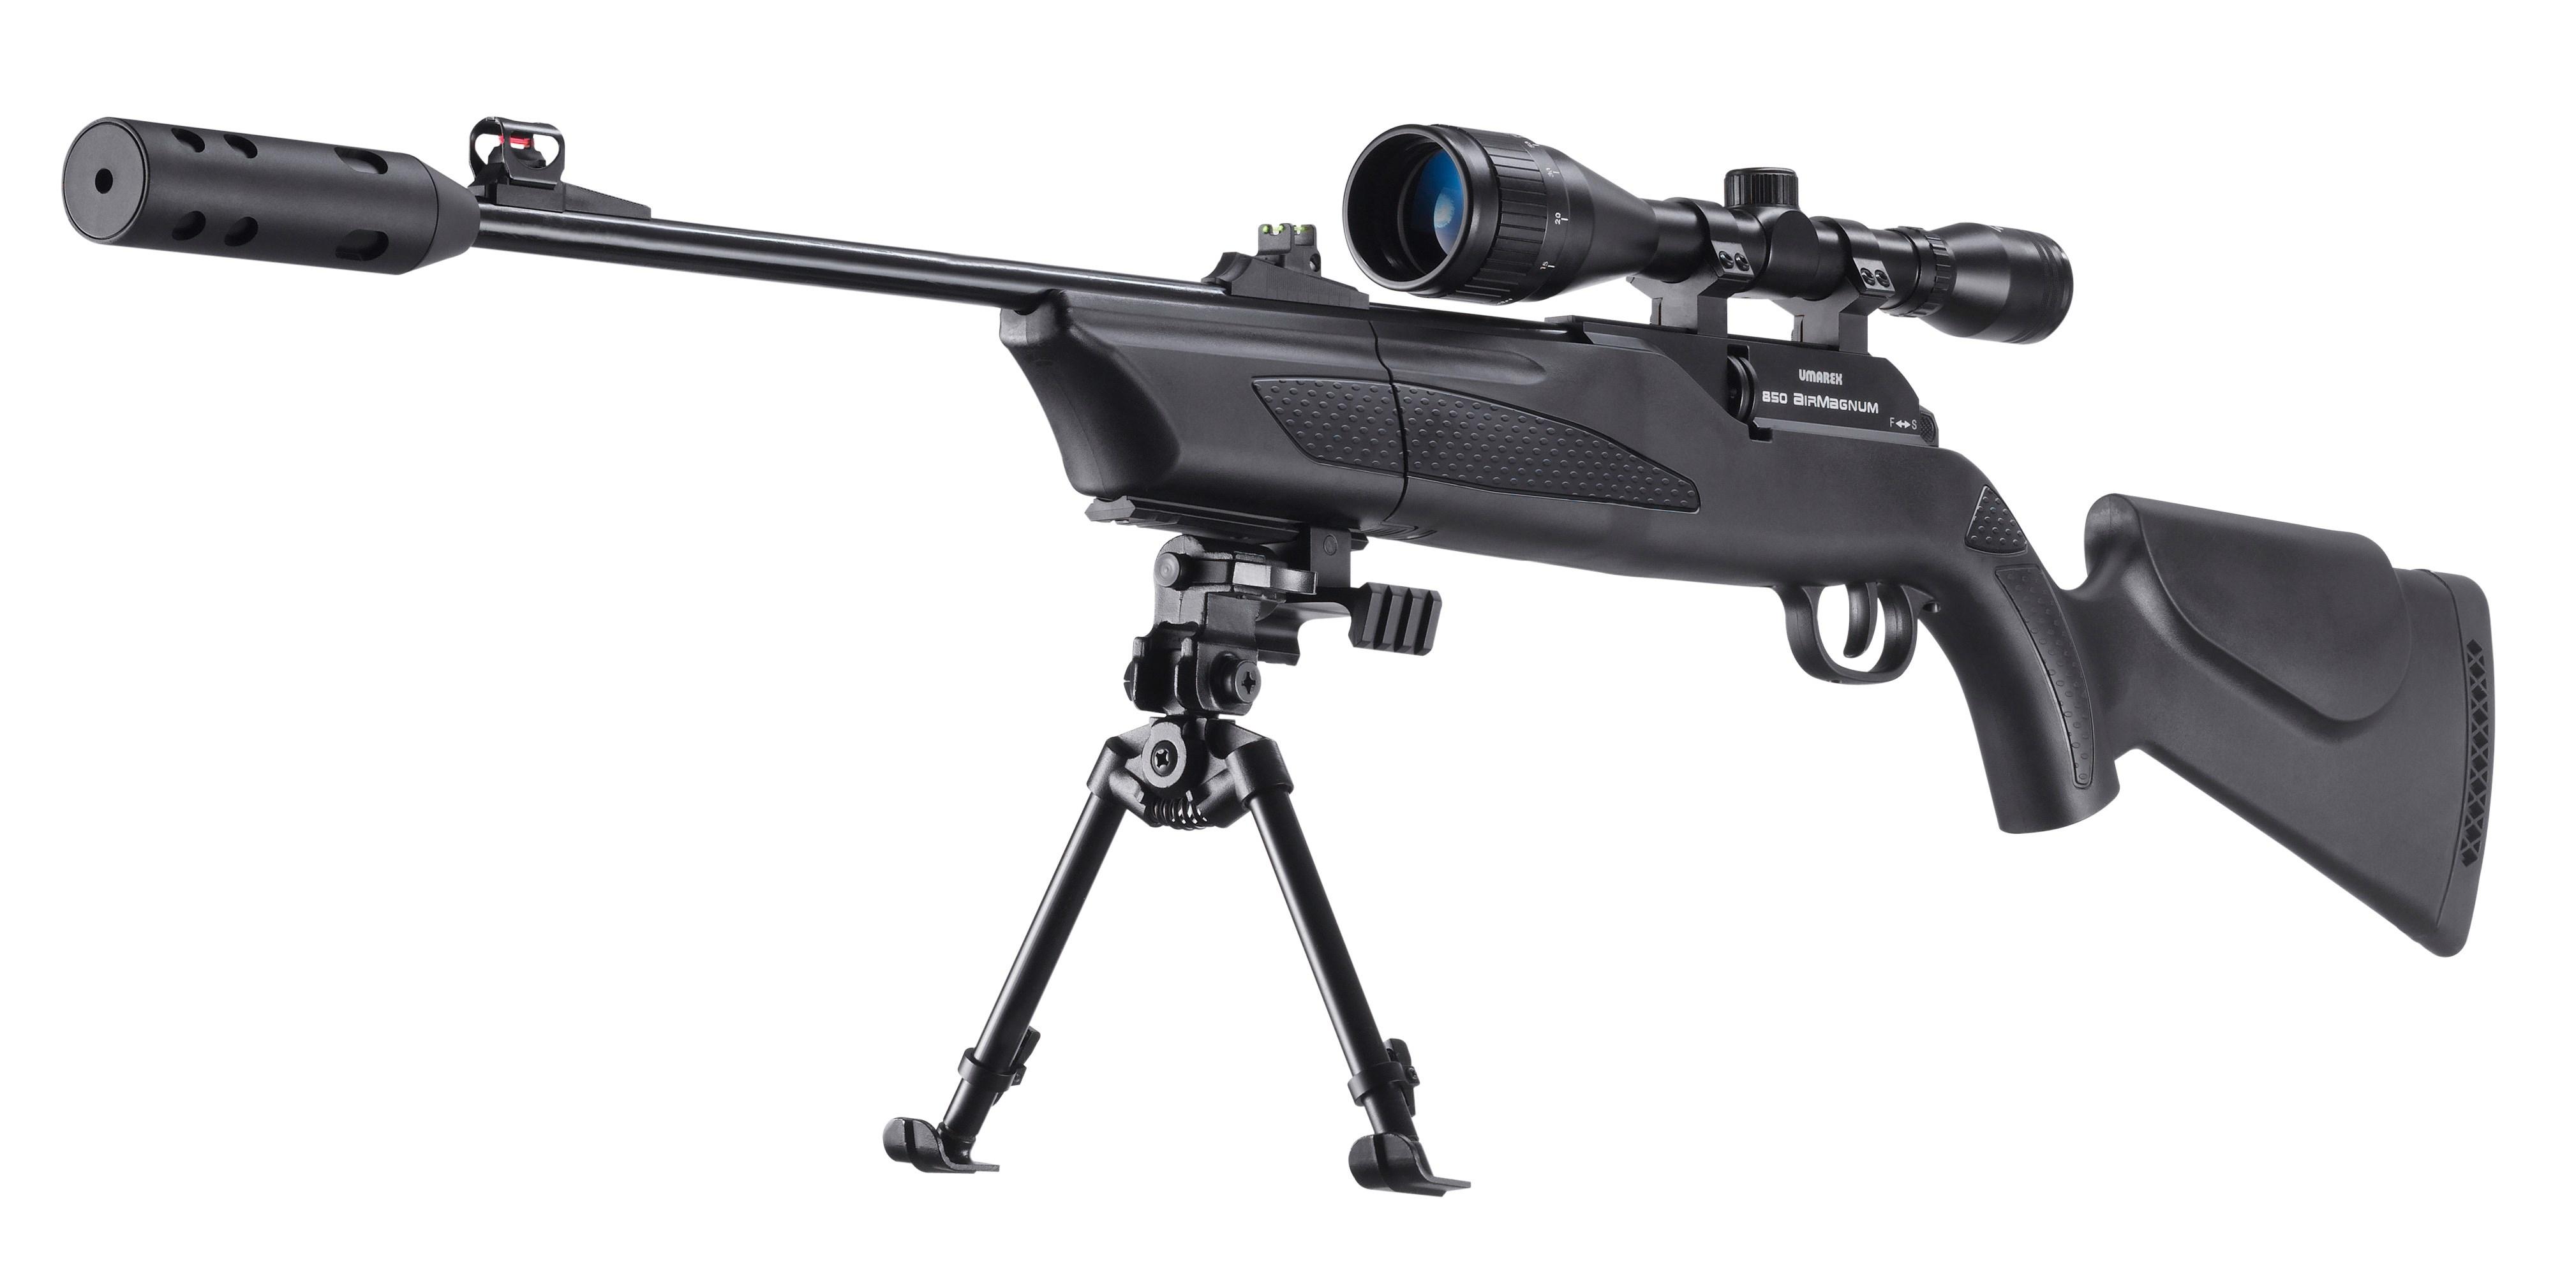 Hammerli 850 Air Magnum XT  177 CO2 Rifle Kit